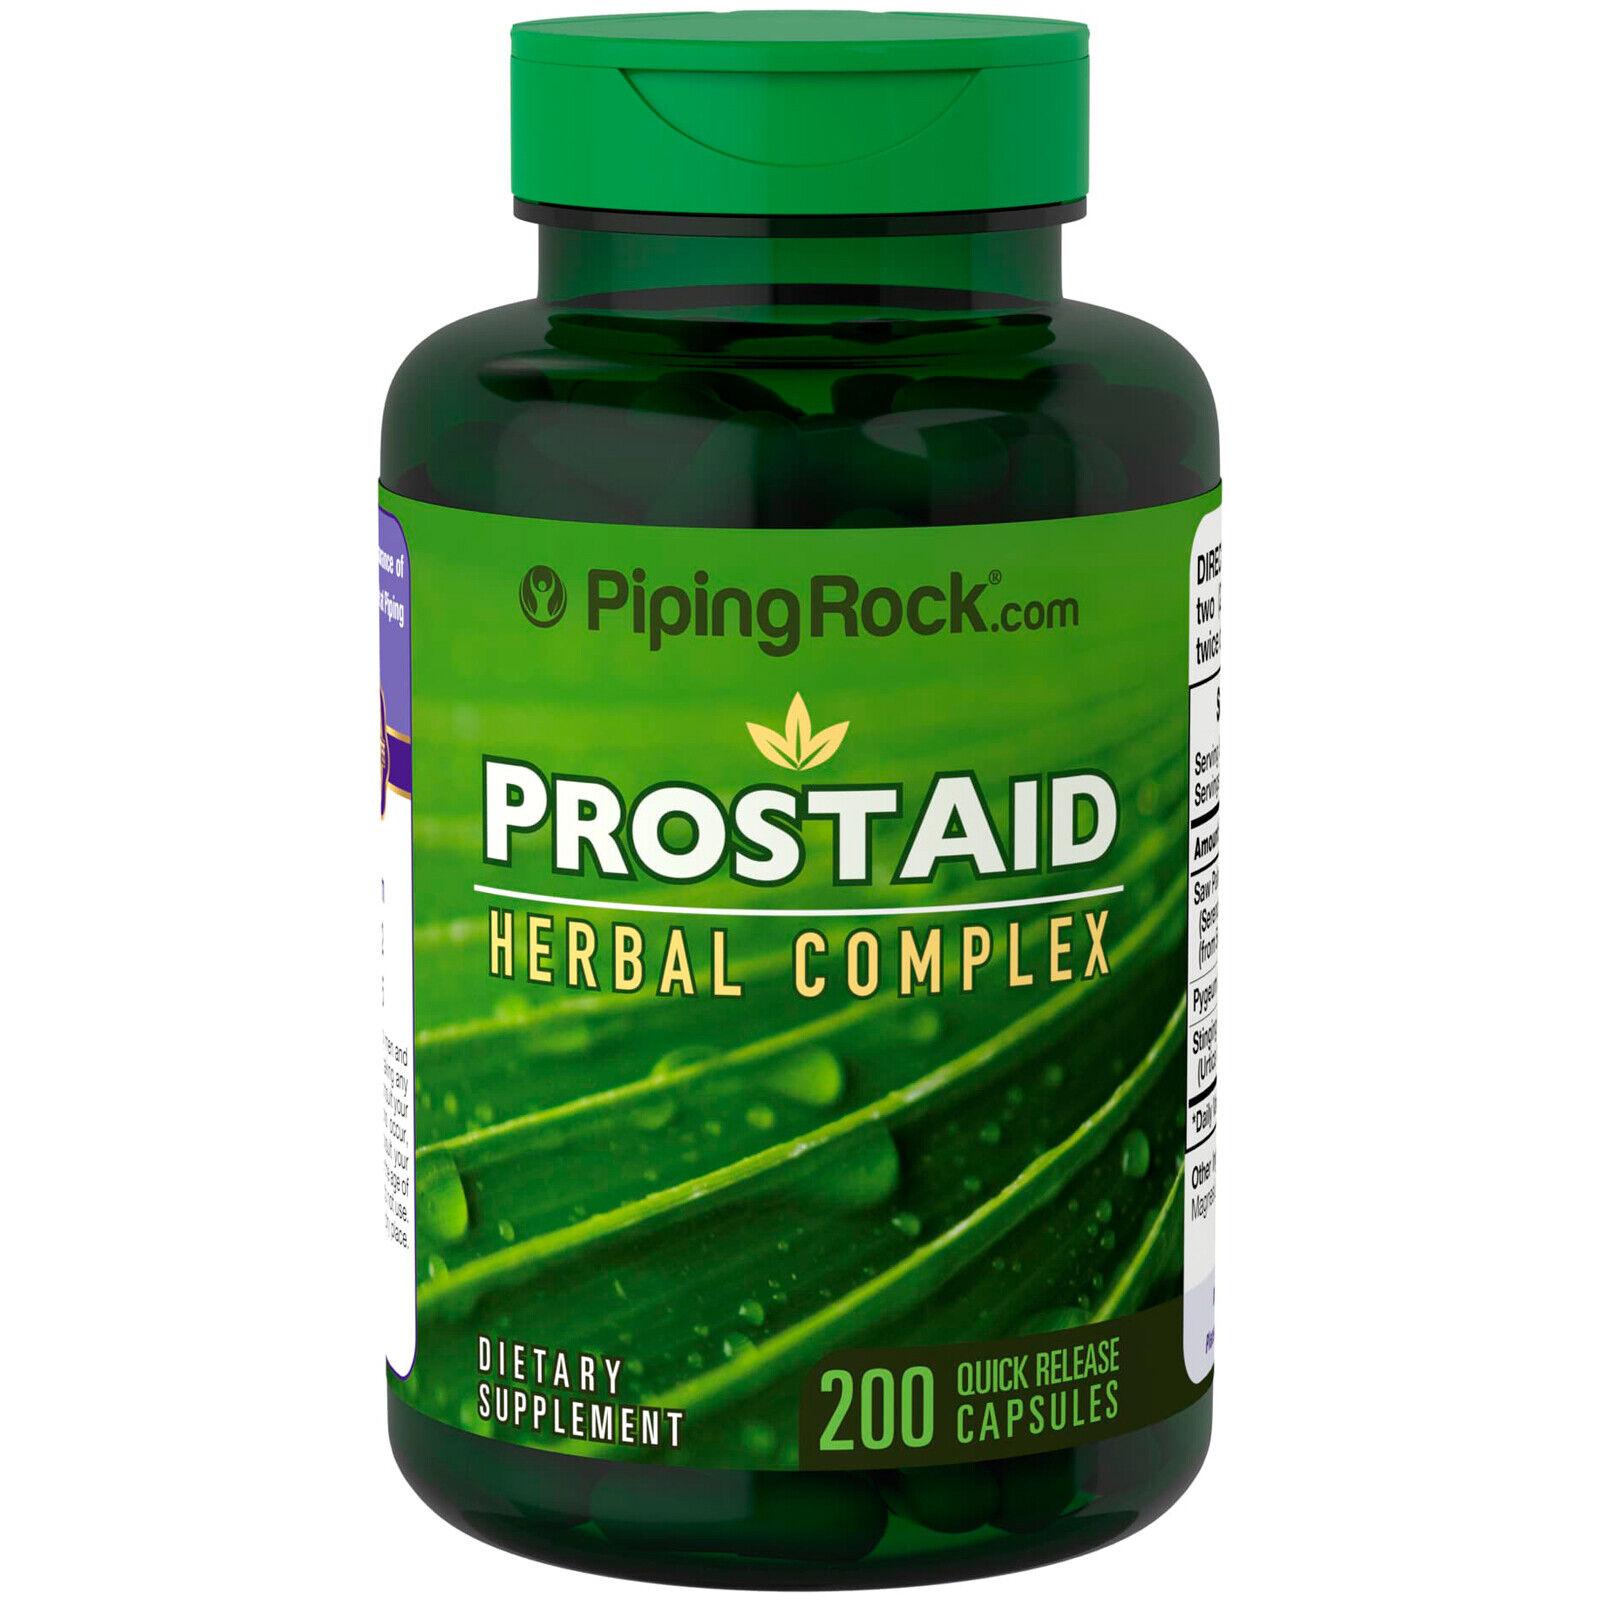 s l1600 - ProstAid 200 Cápsulas - Saw Palmetto + Pygeum + Ortiga + Licopeno